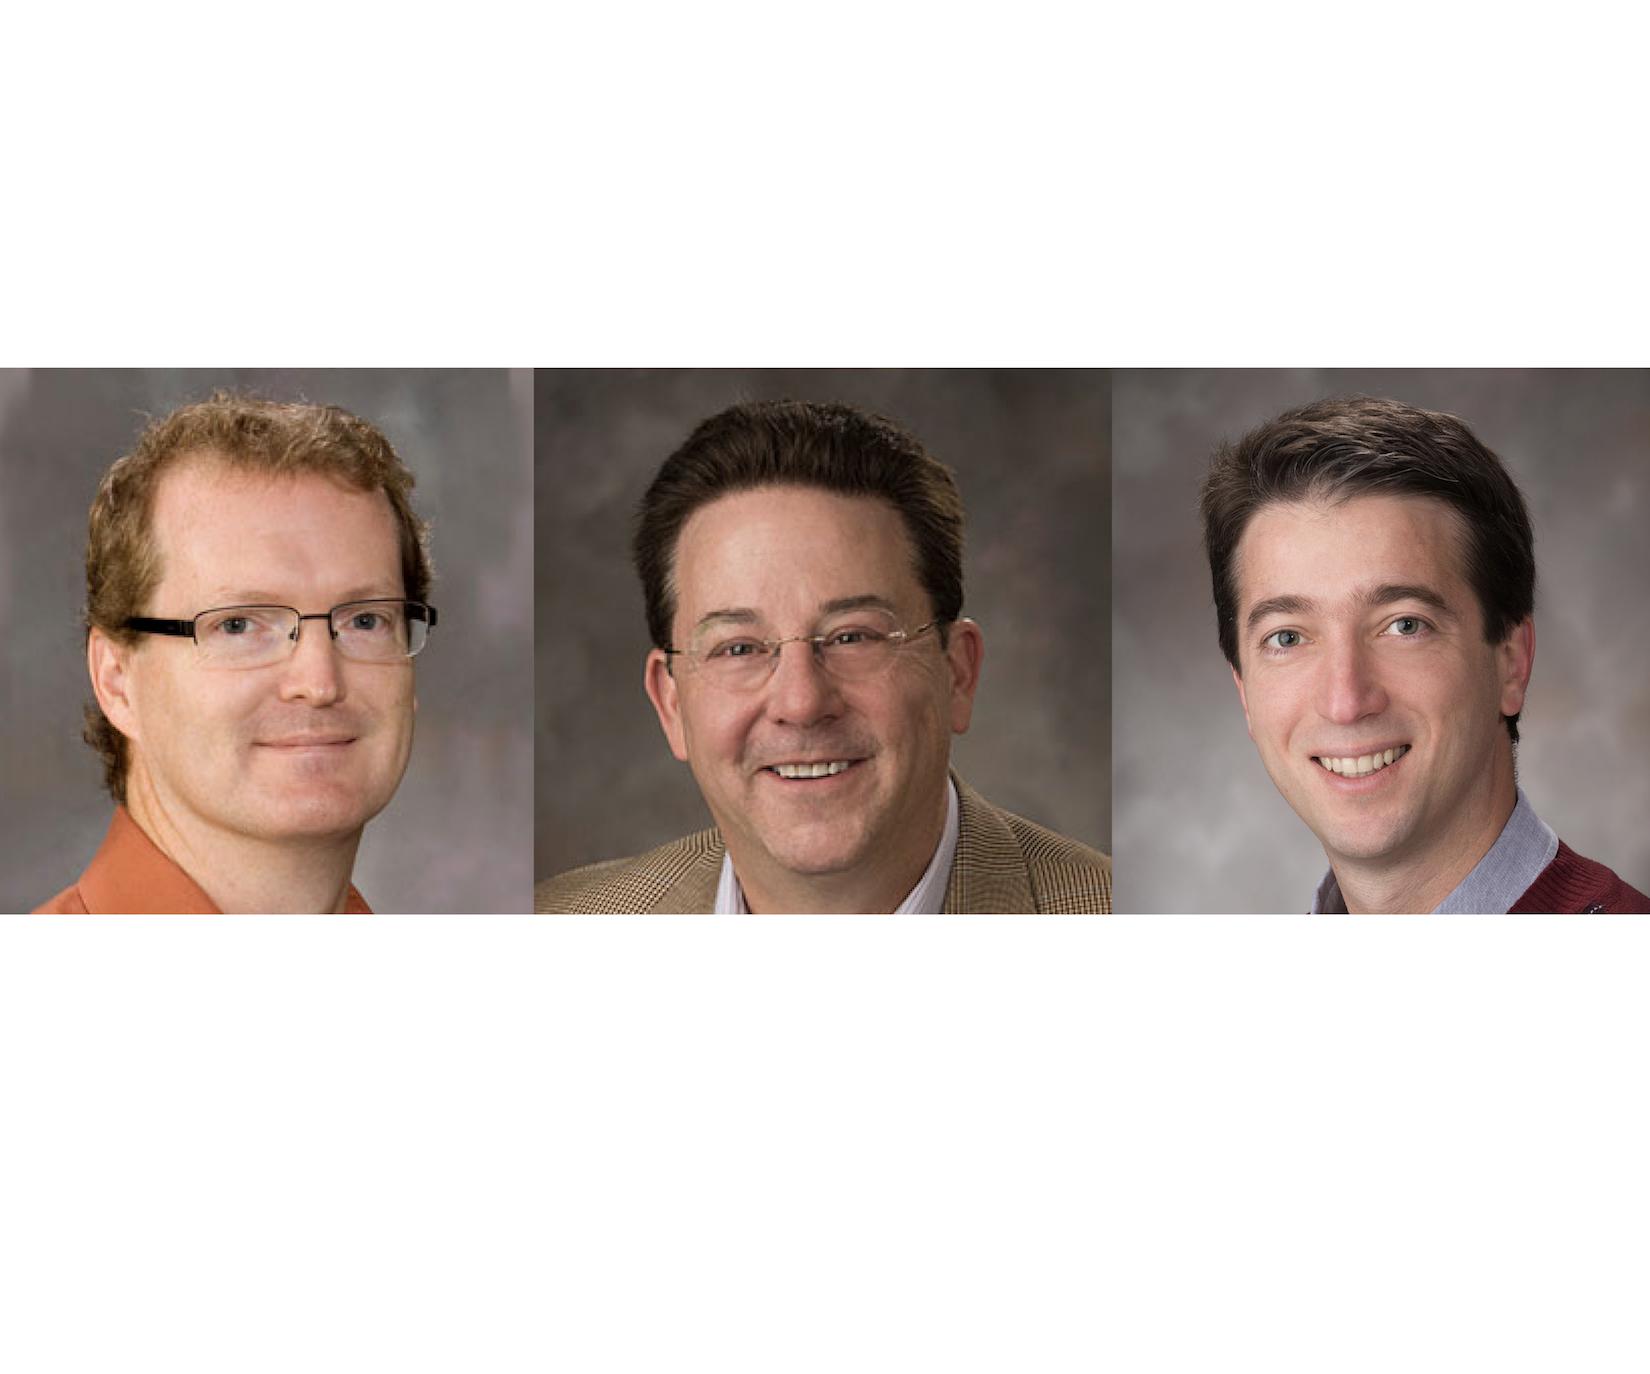 Matthew Dwyer, Gregg Rothermel, Sebastian Elbaum